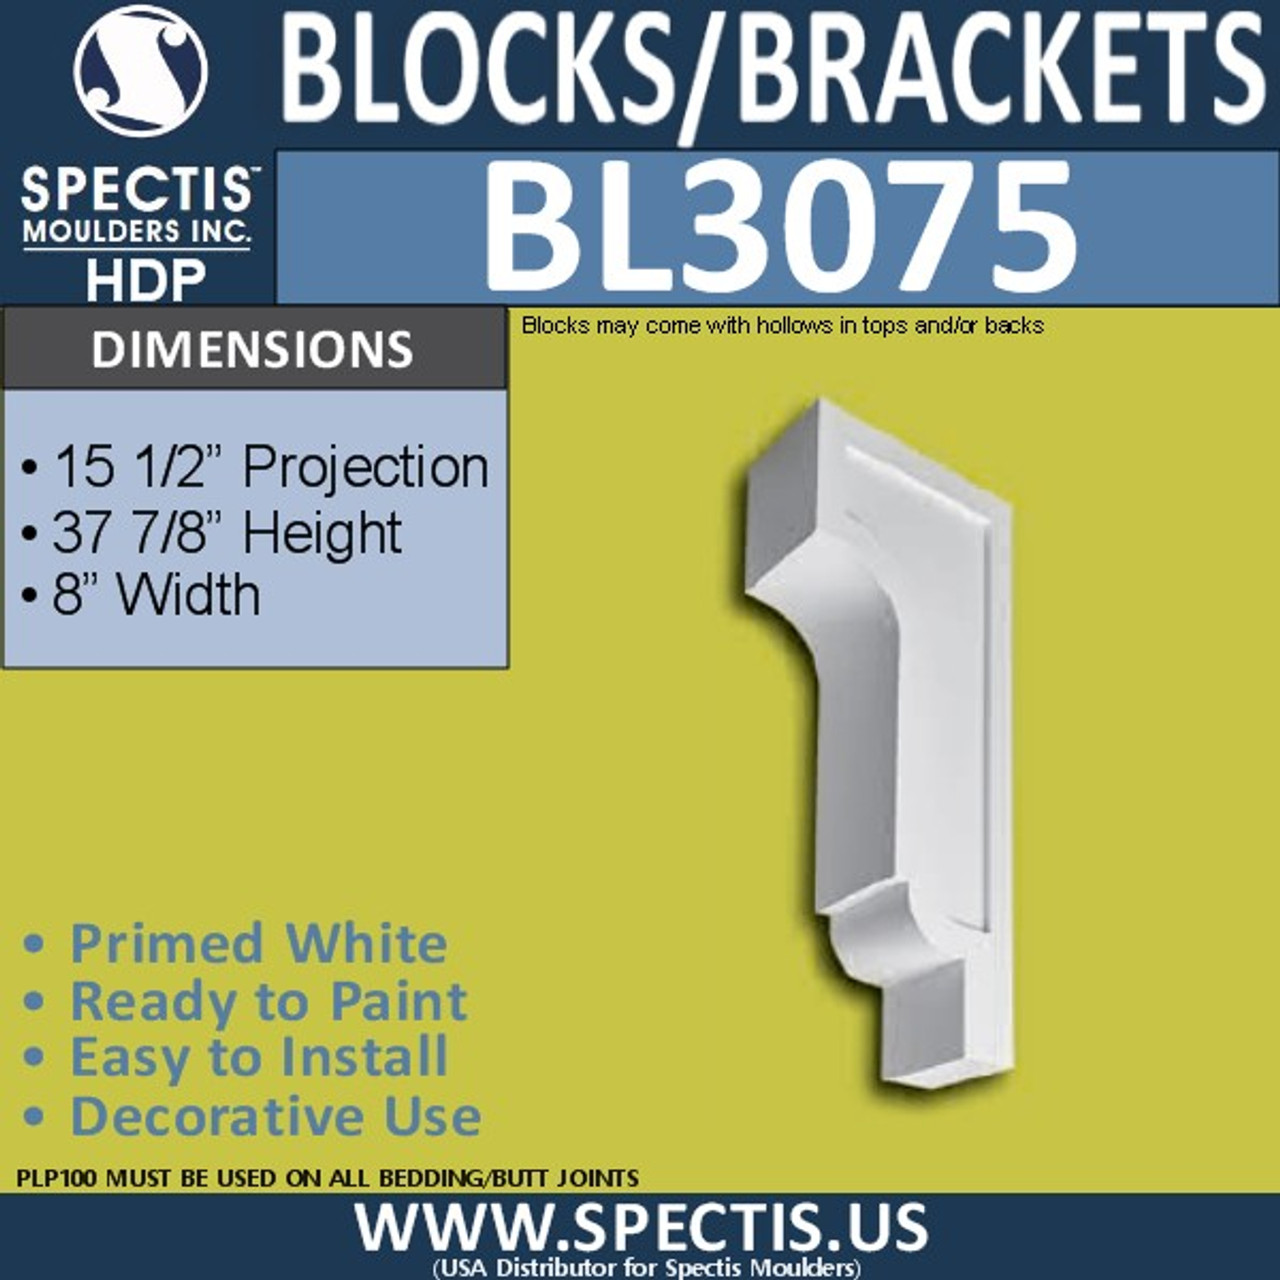 "BL3075 Eave Block or Bracket 8""W x 37.88""H x 15.5"" P"